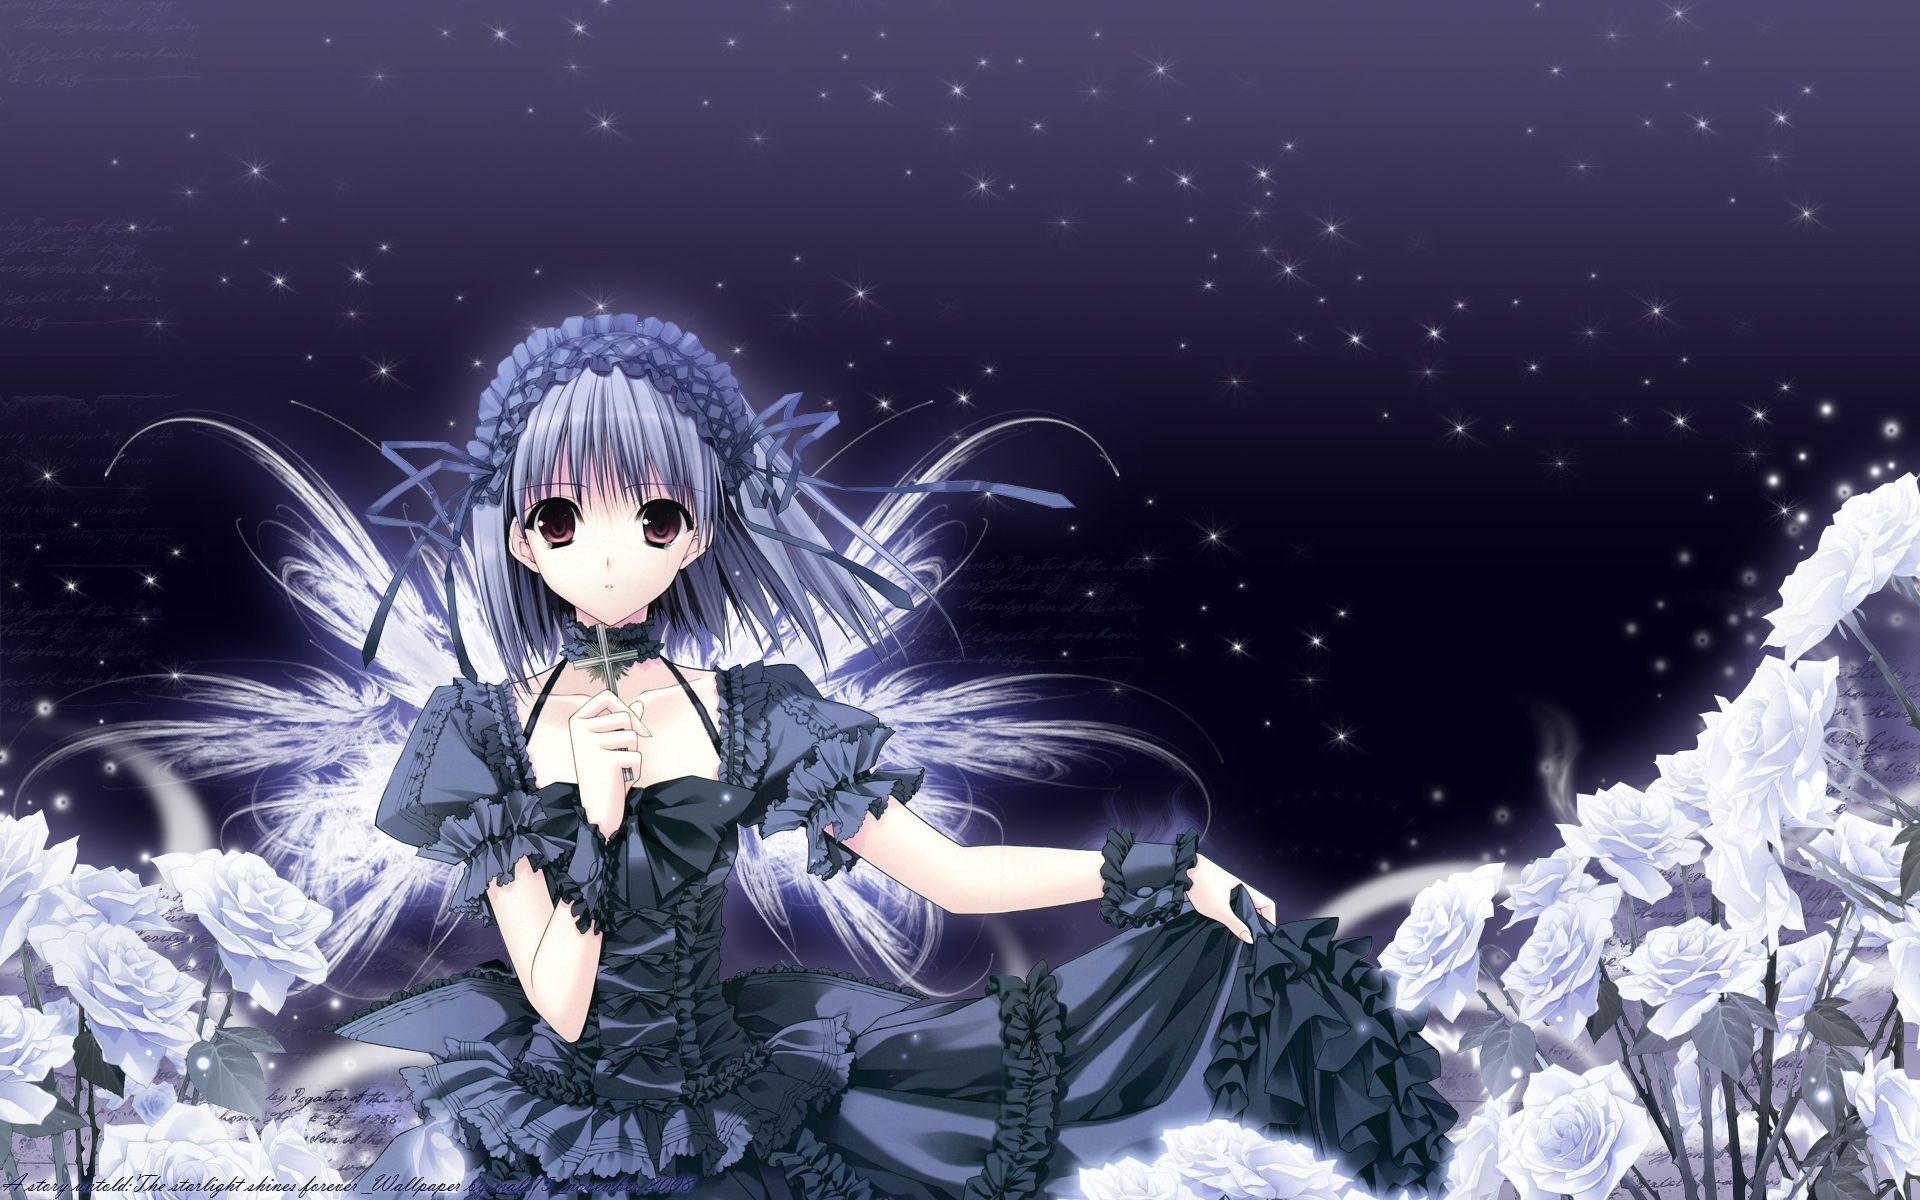 Res: 1920x1200, Anime Girl Black Dress and White Roses HD Wallpaper